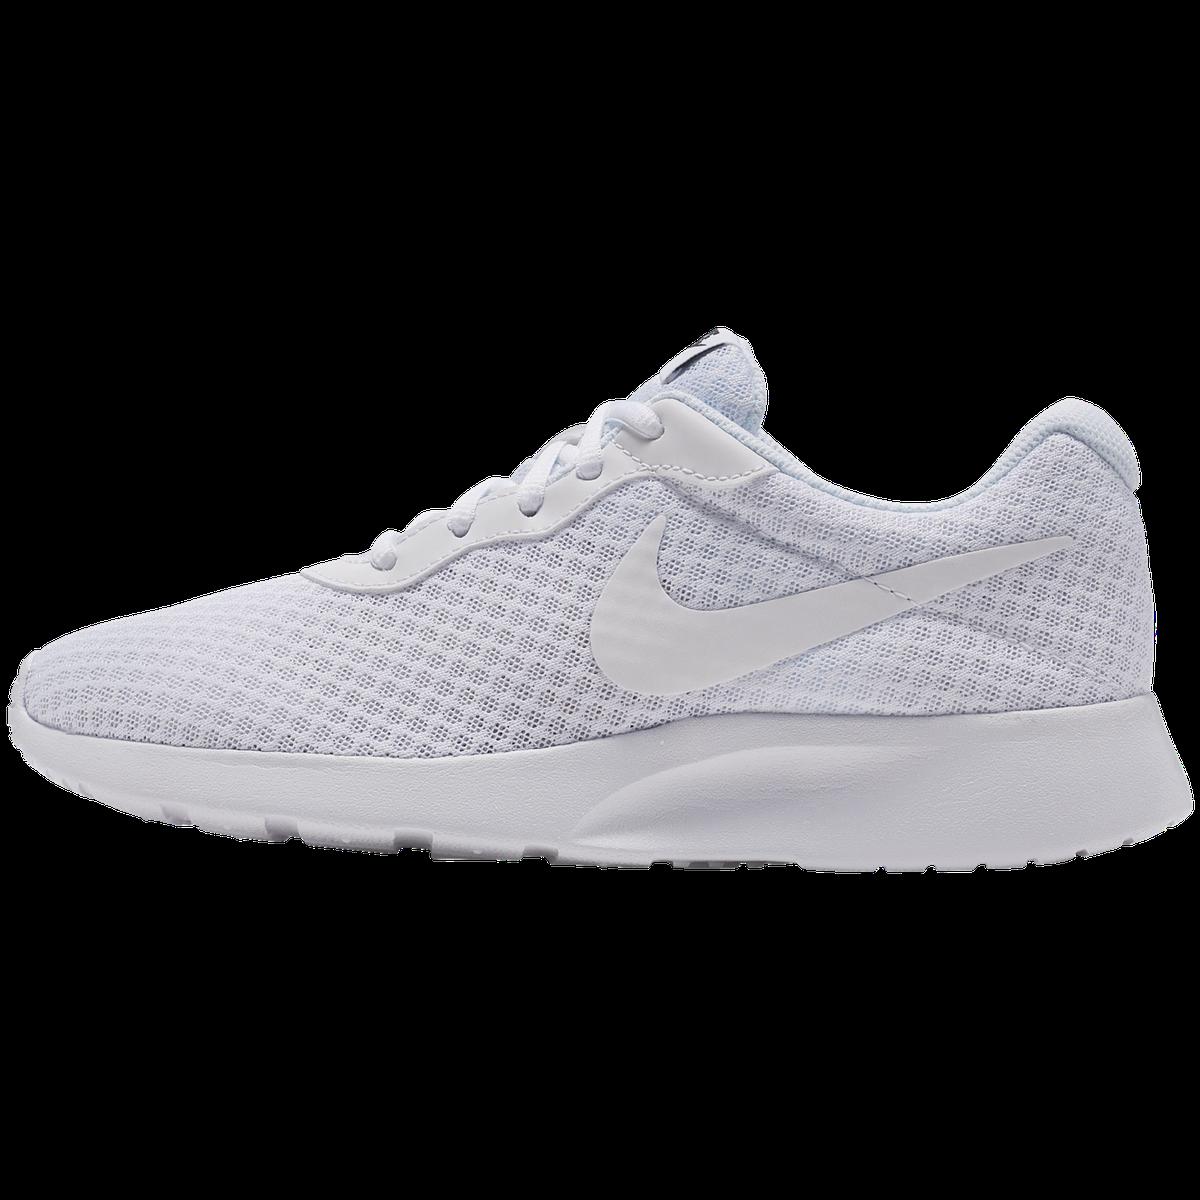 low priced c9bce e6c47 Nike Tanjun W White White-Black - Valkoinen - Naisten vapaa-ajan kengät    XXL